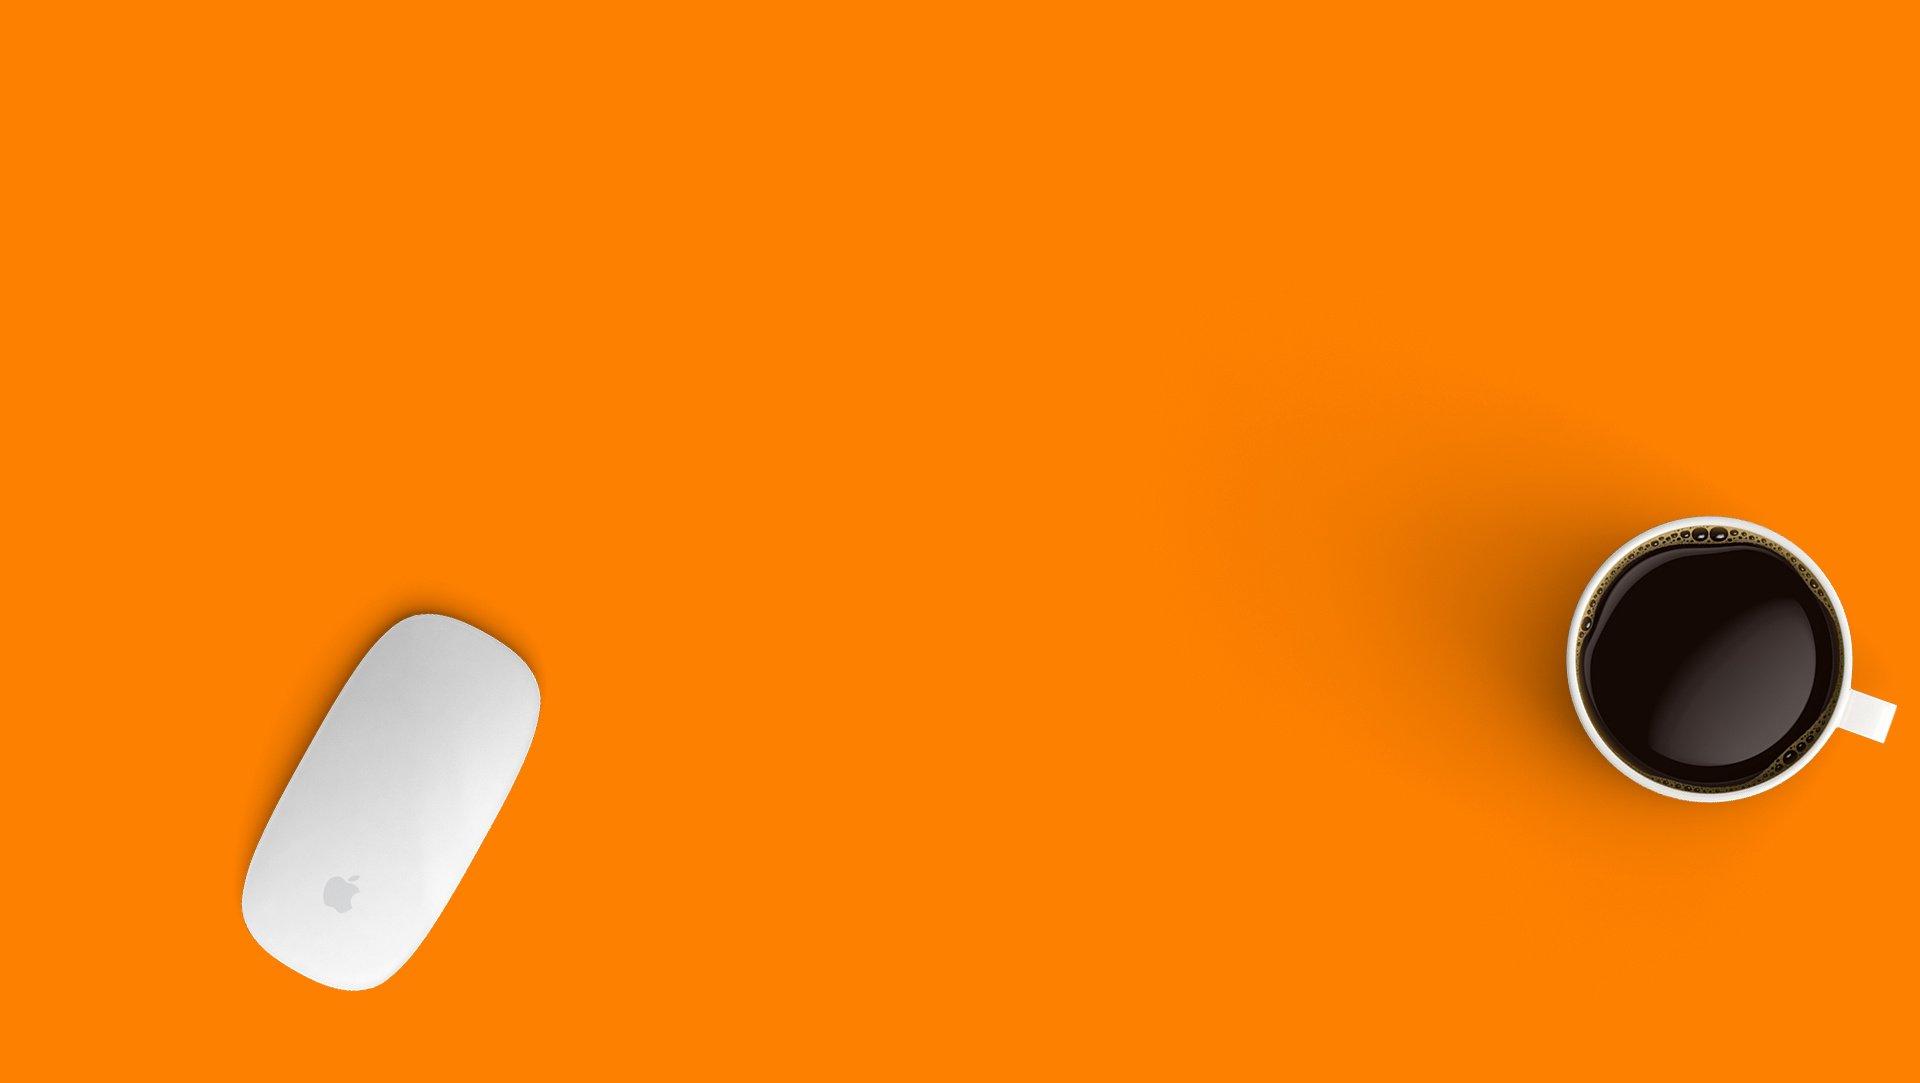 Search Engine Optimisation (SEO) & Social Media Management